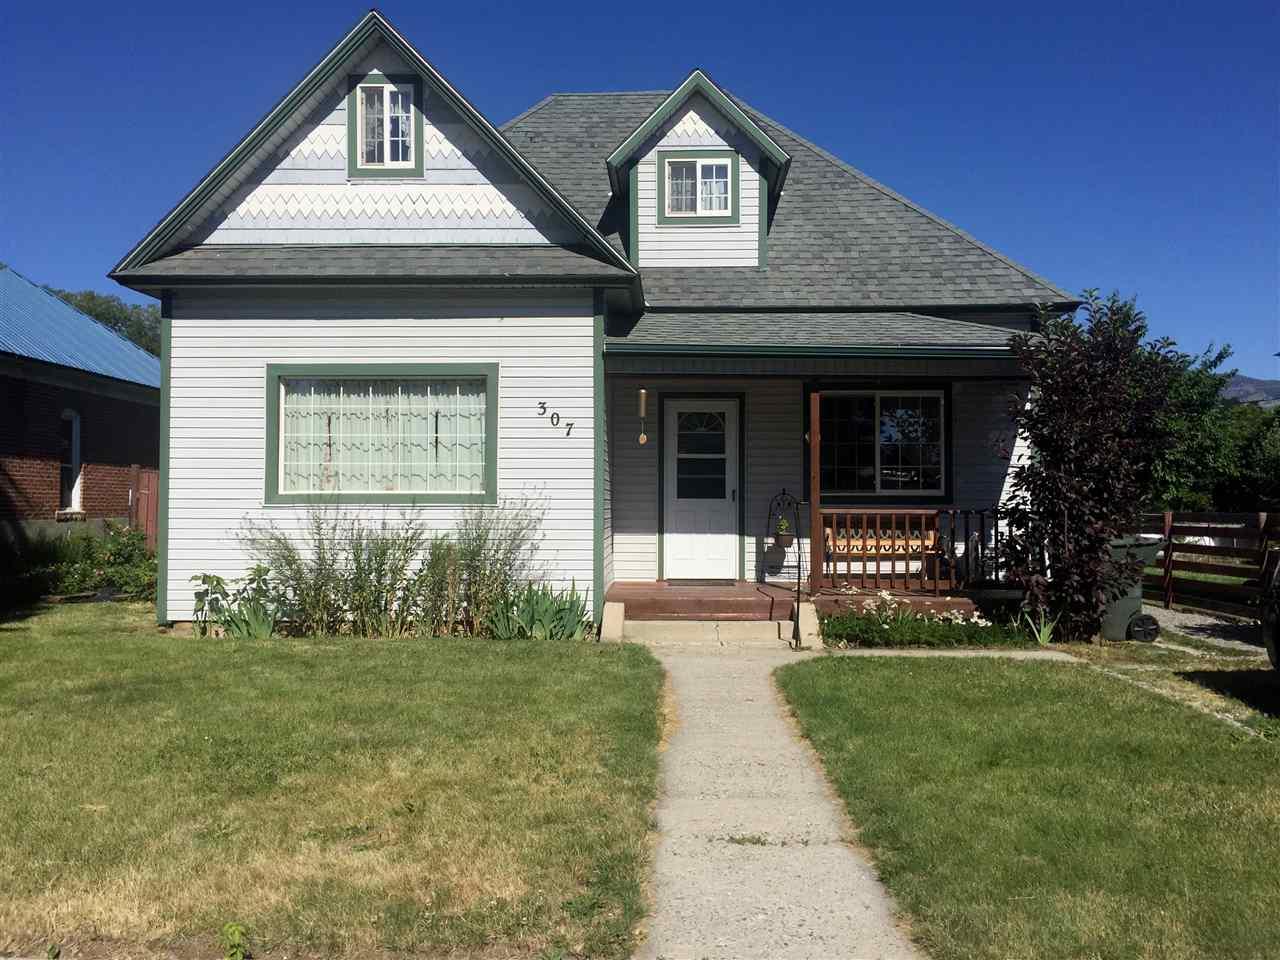 307 S Terrace Street, Salmon, ID 83467